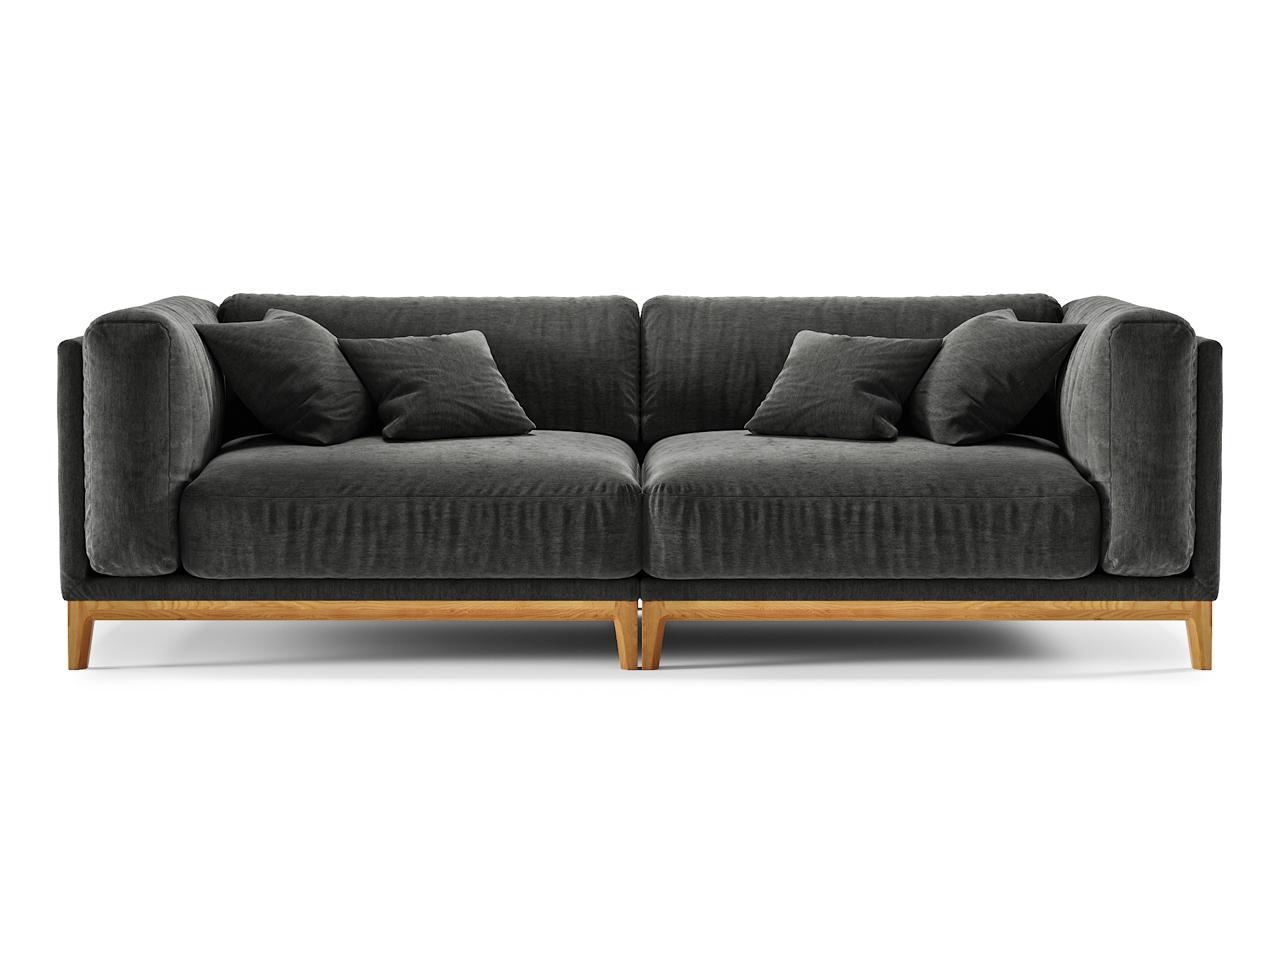 The idea диван case черный 108433/6